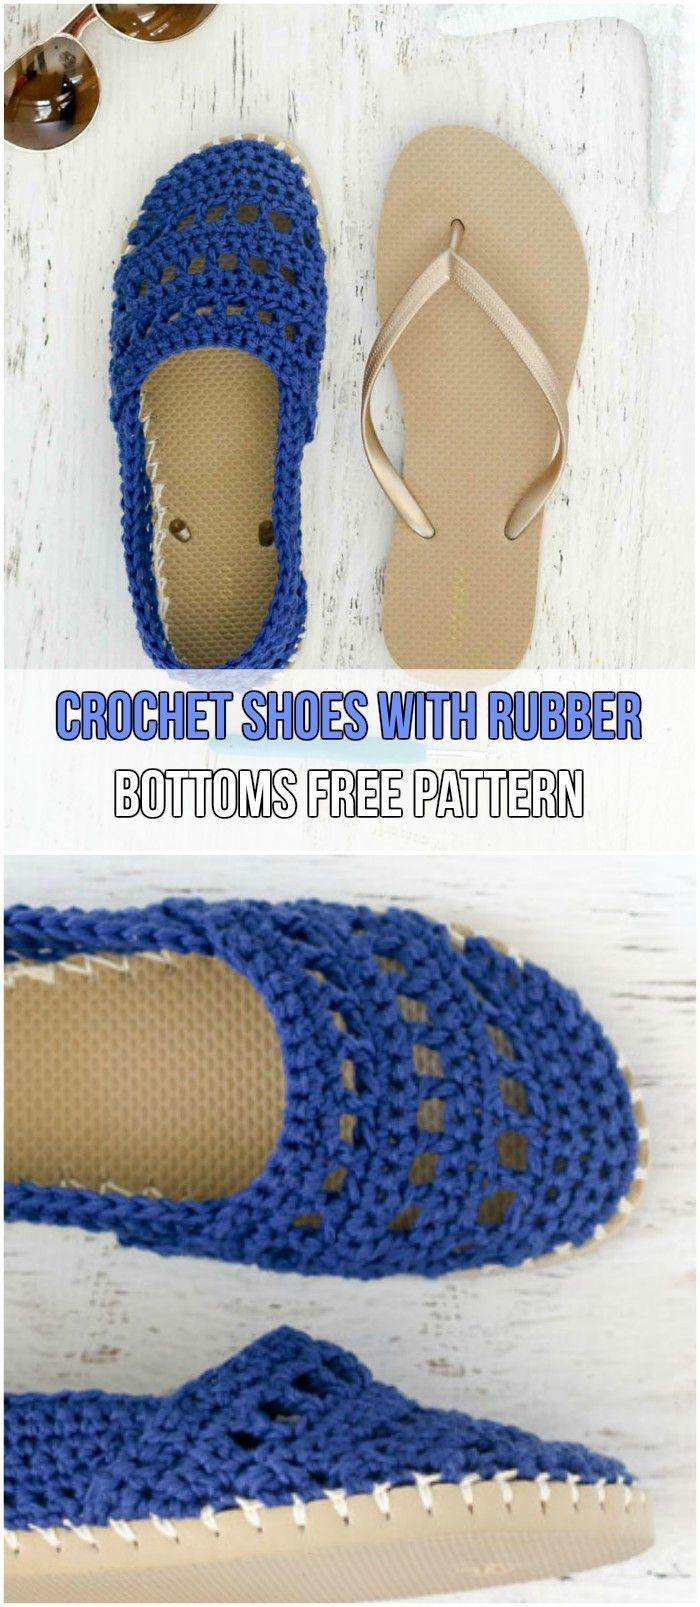 7 Easy Crochet Slippers Free Patterns | Pinterest | Häkelideen ...